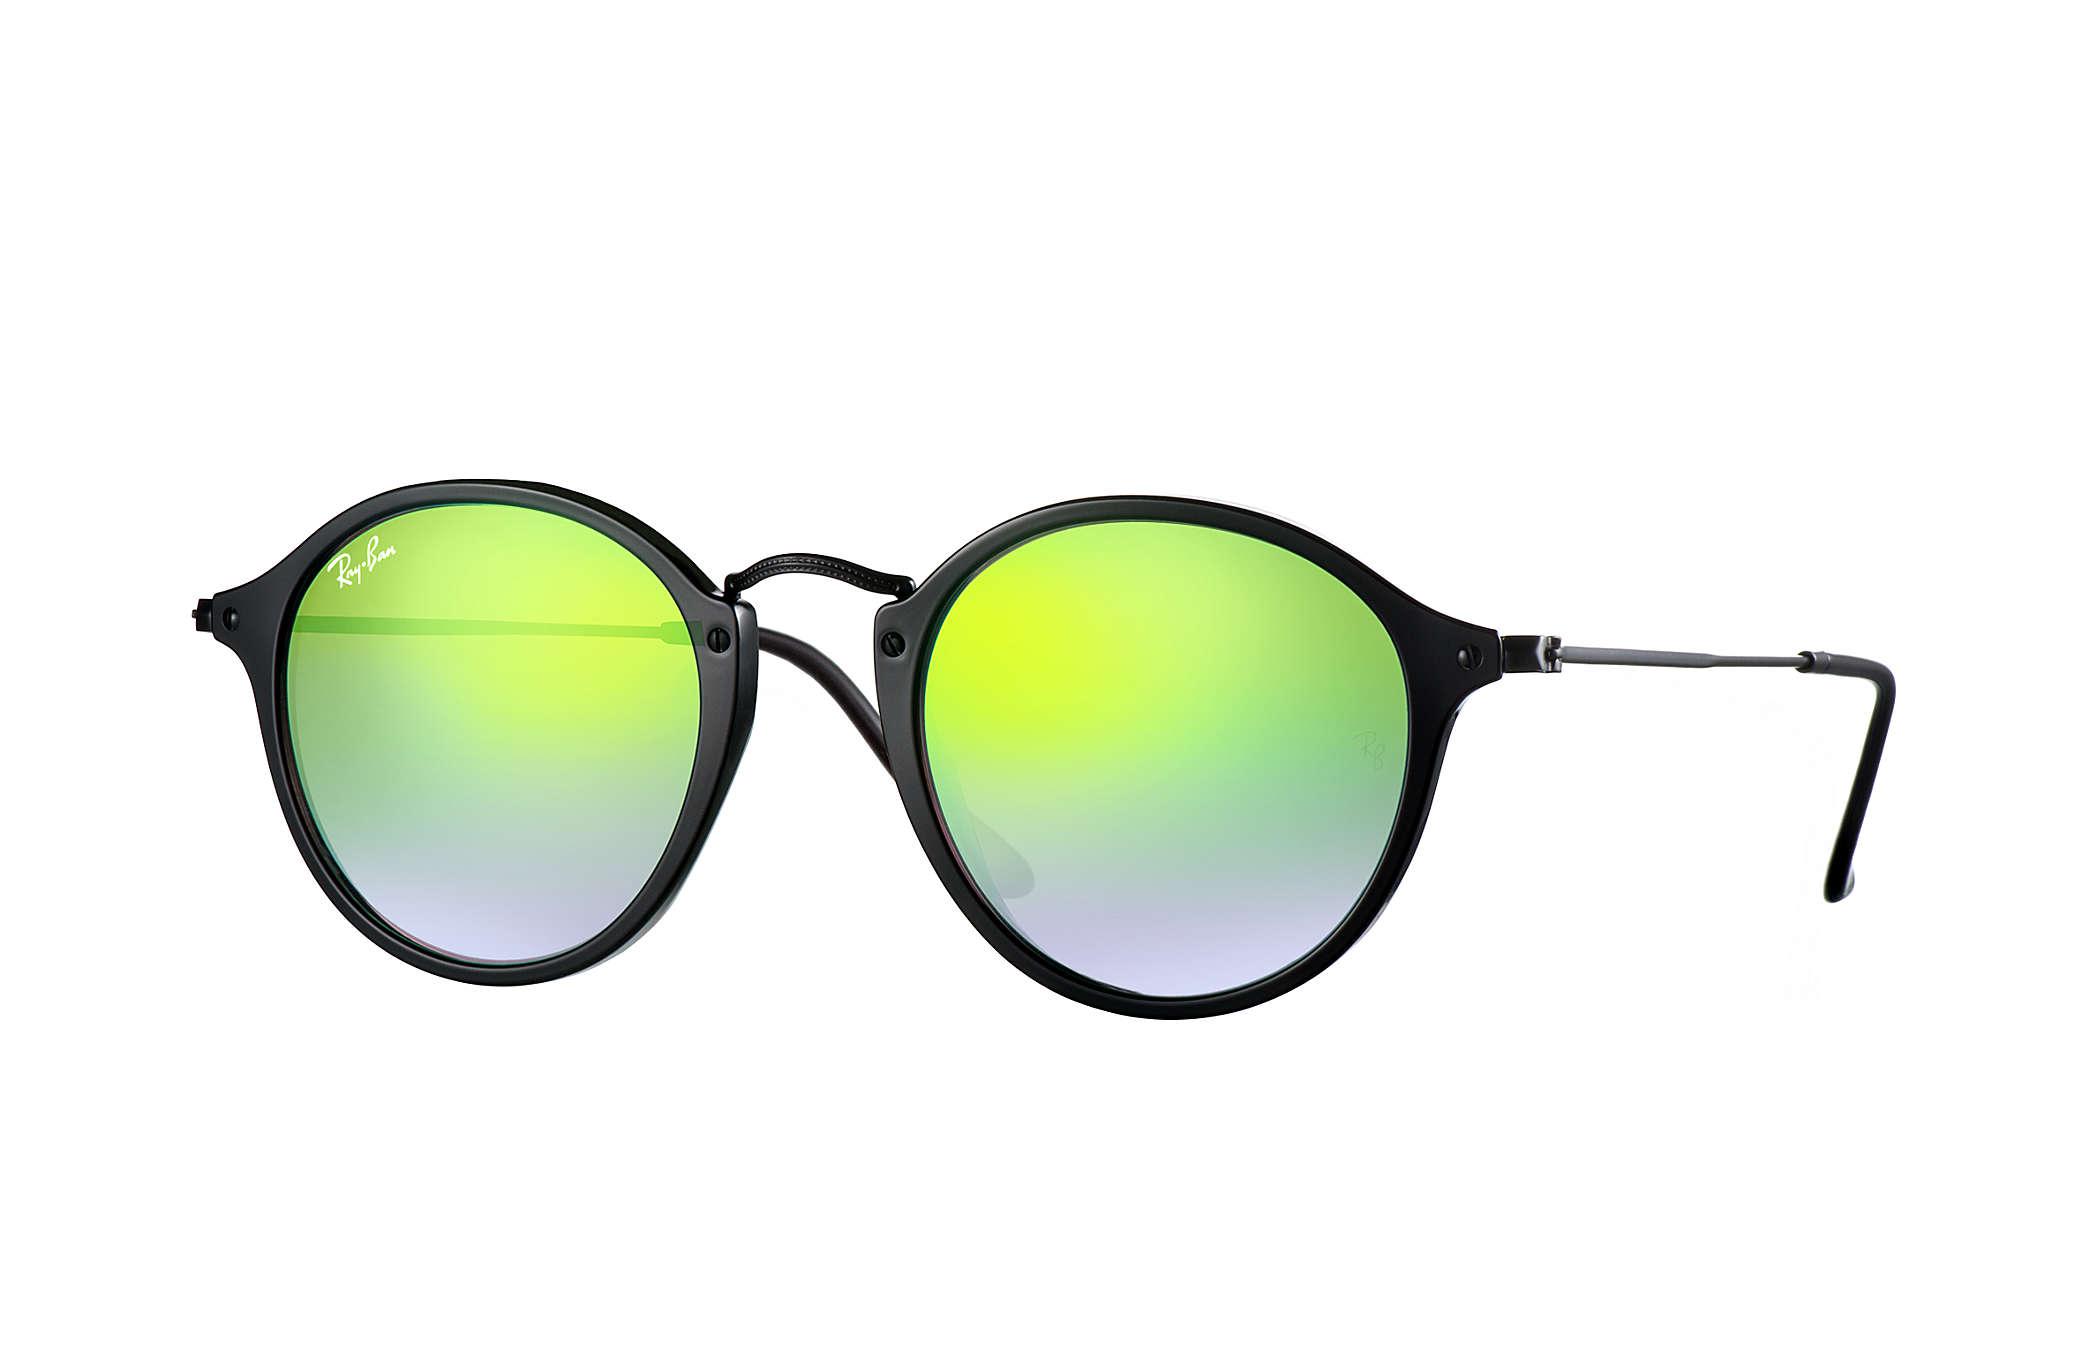 Ray-Ban RB2447 Round Sunglasses $69 @ Massdrop $69.99